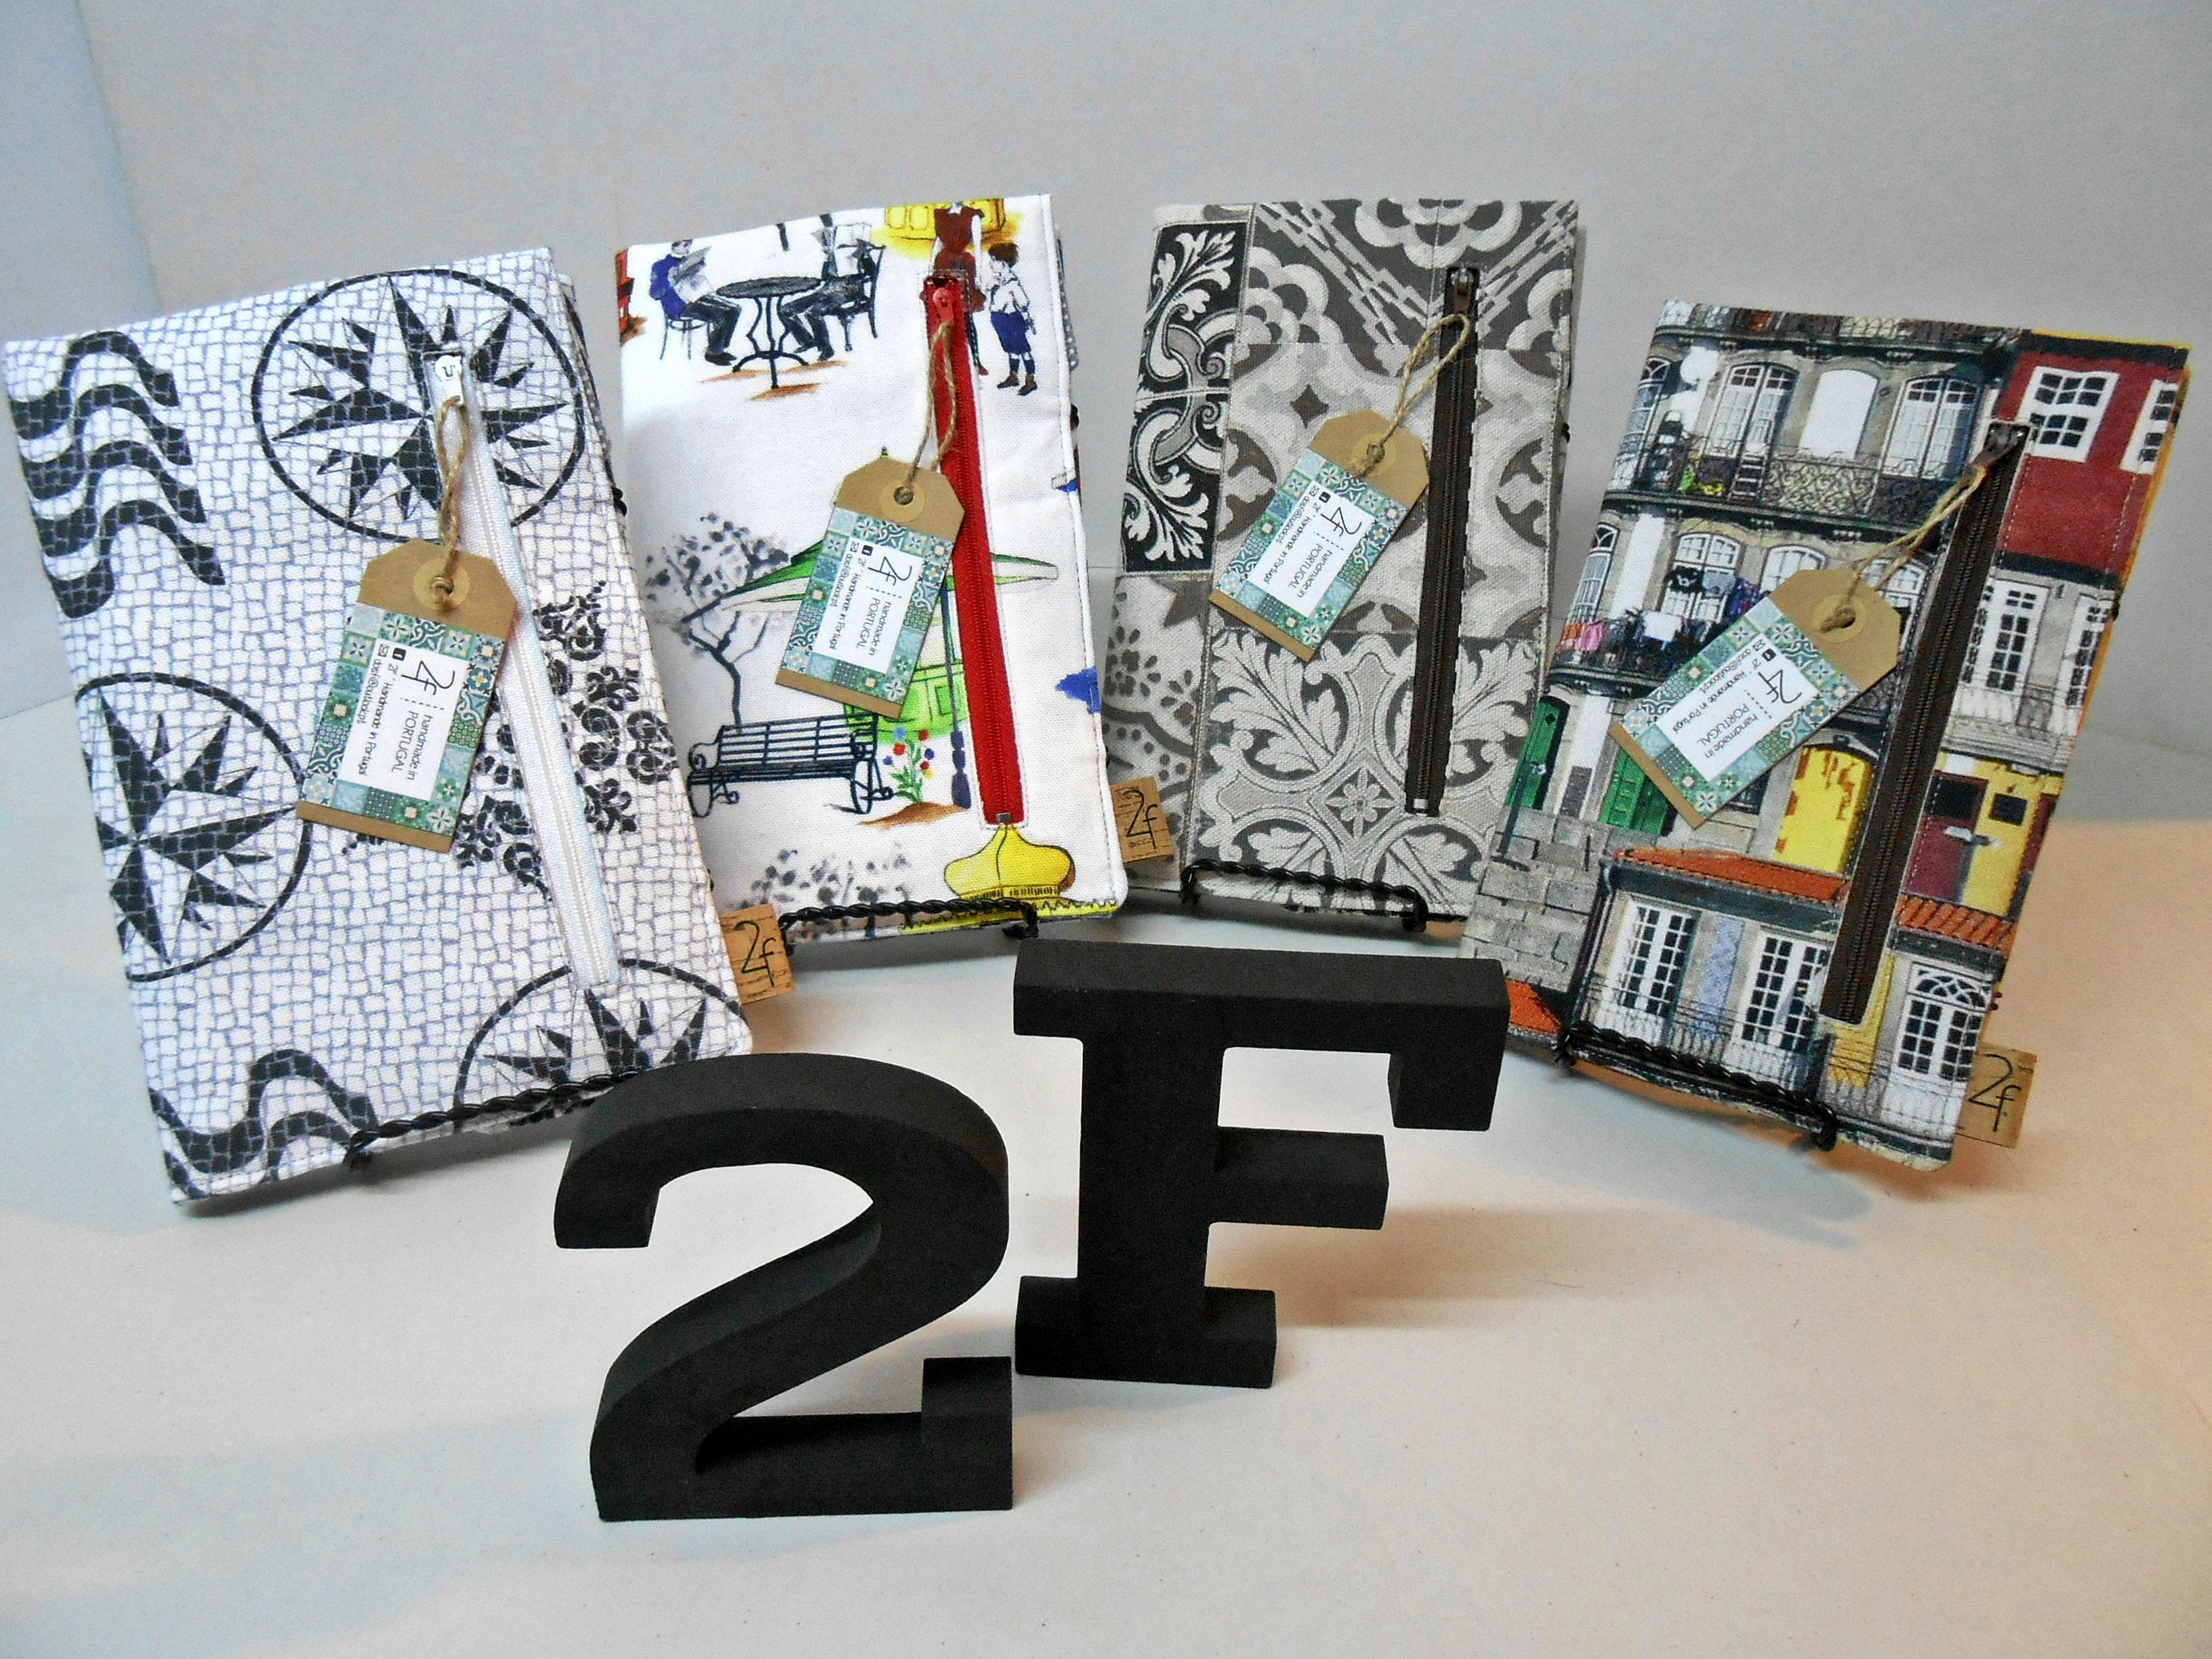 Adesivo De Francesinha Onde Comprar ~ 2F' Handmade in Portugal Acessórios Artesanato Contempor u00e2neo